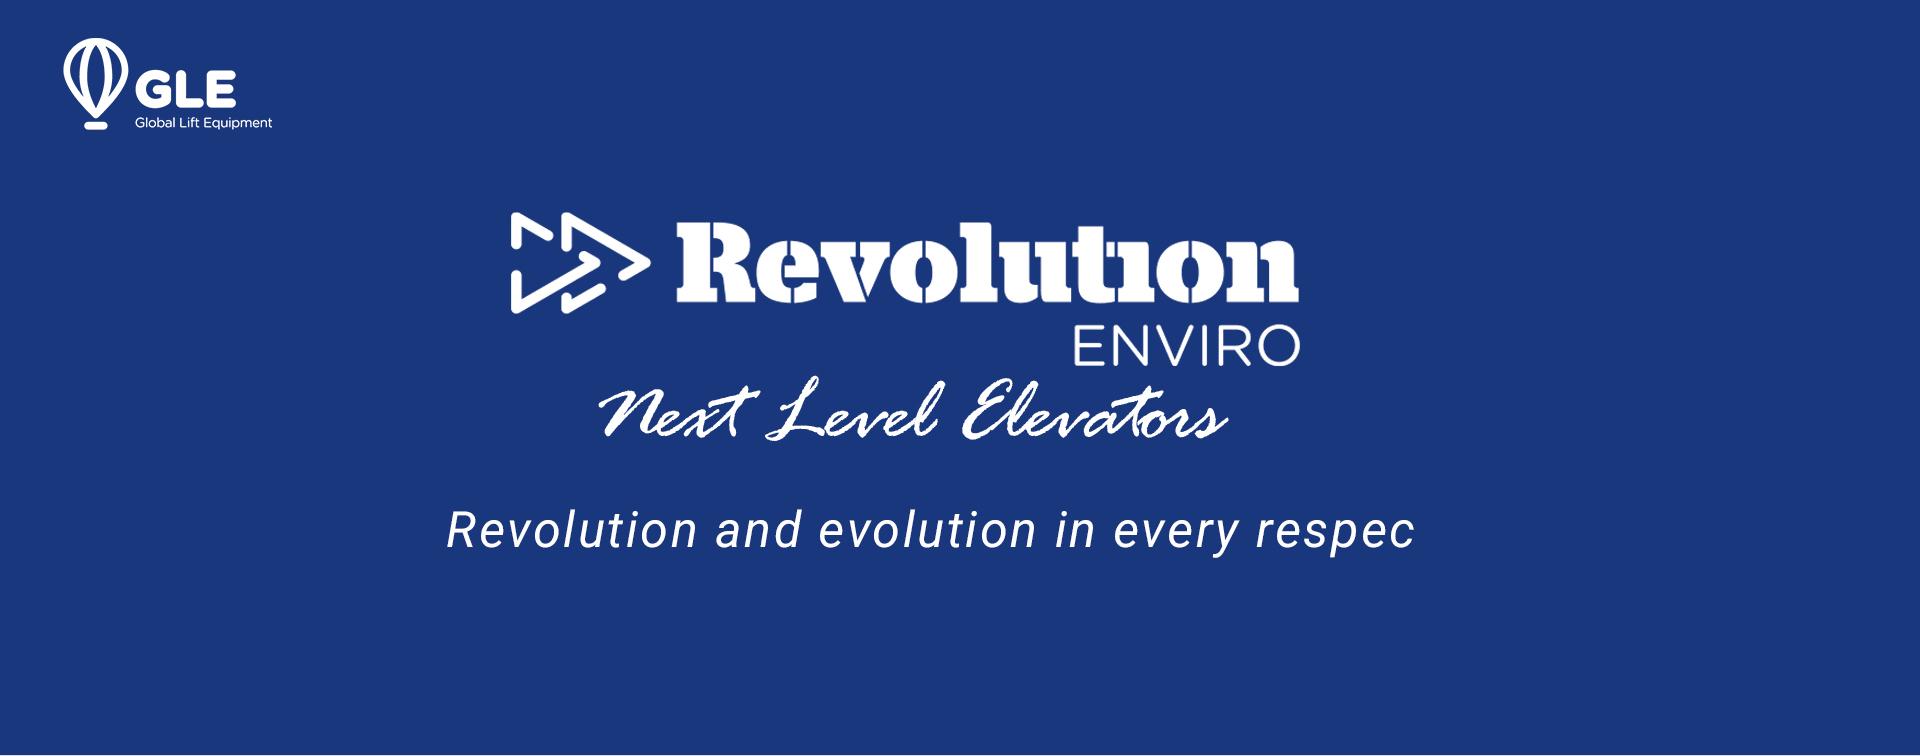 Revolution and evolution in every respect: Enviro REVOLUTION®